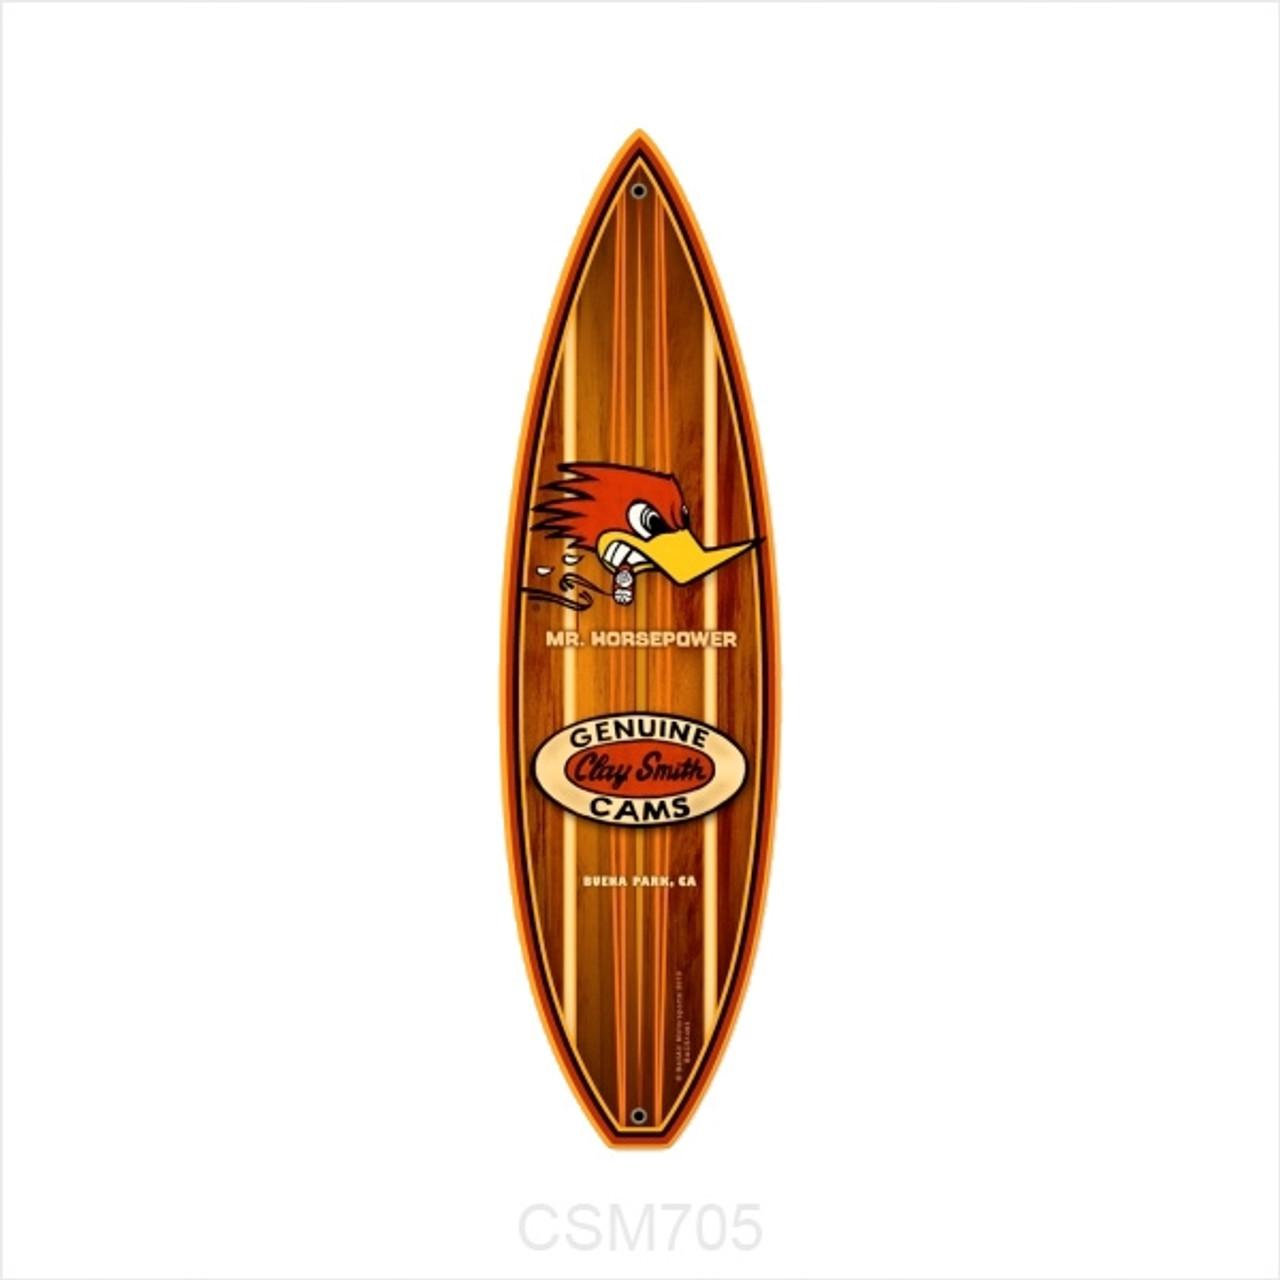 Genuine Clay Smith Cams Surfboard